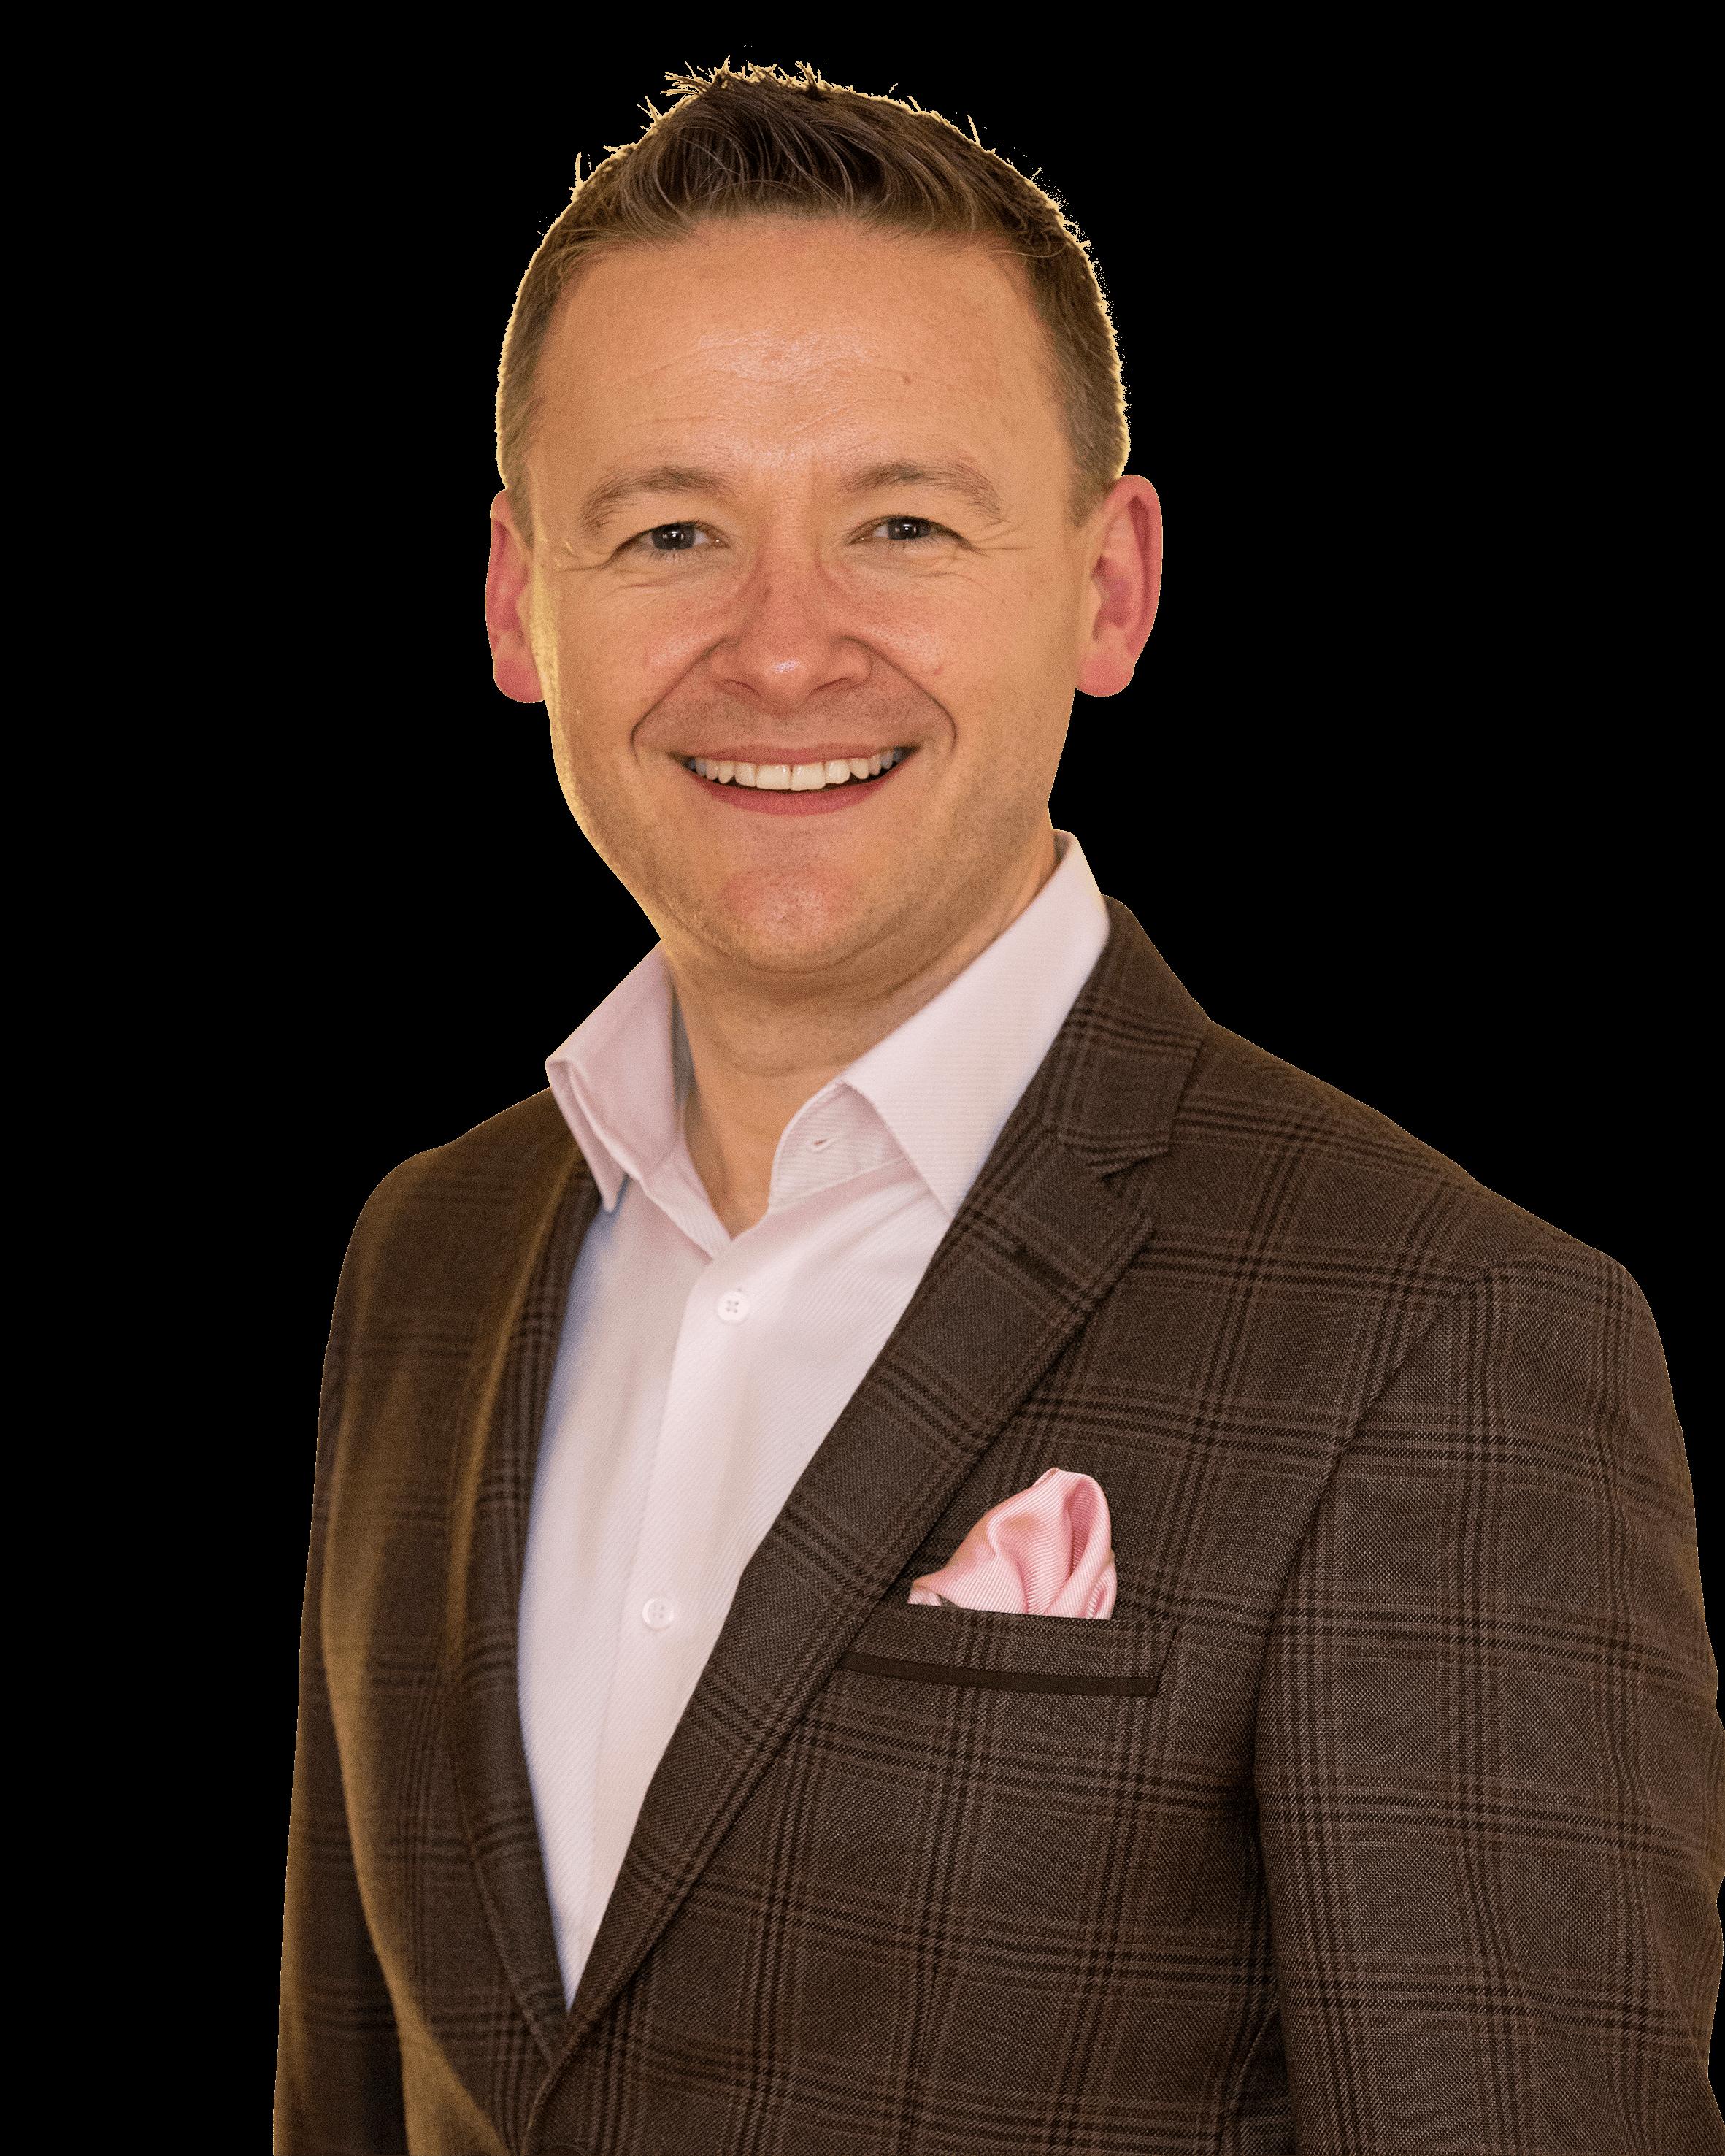 Rowan O'Donoghue